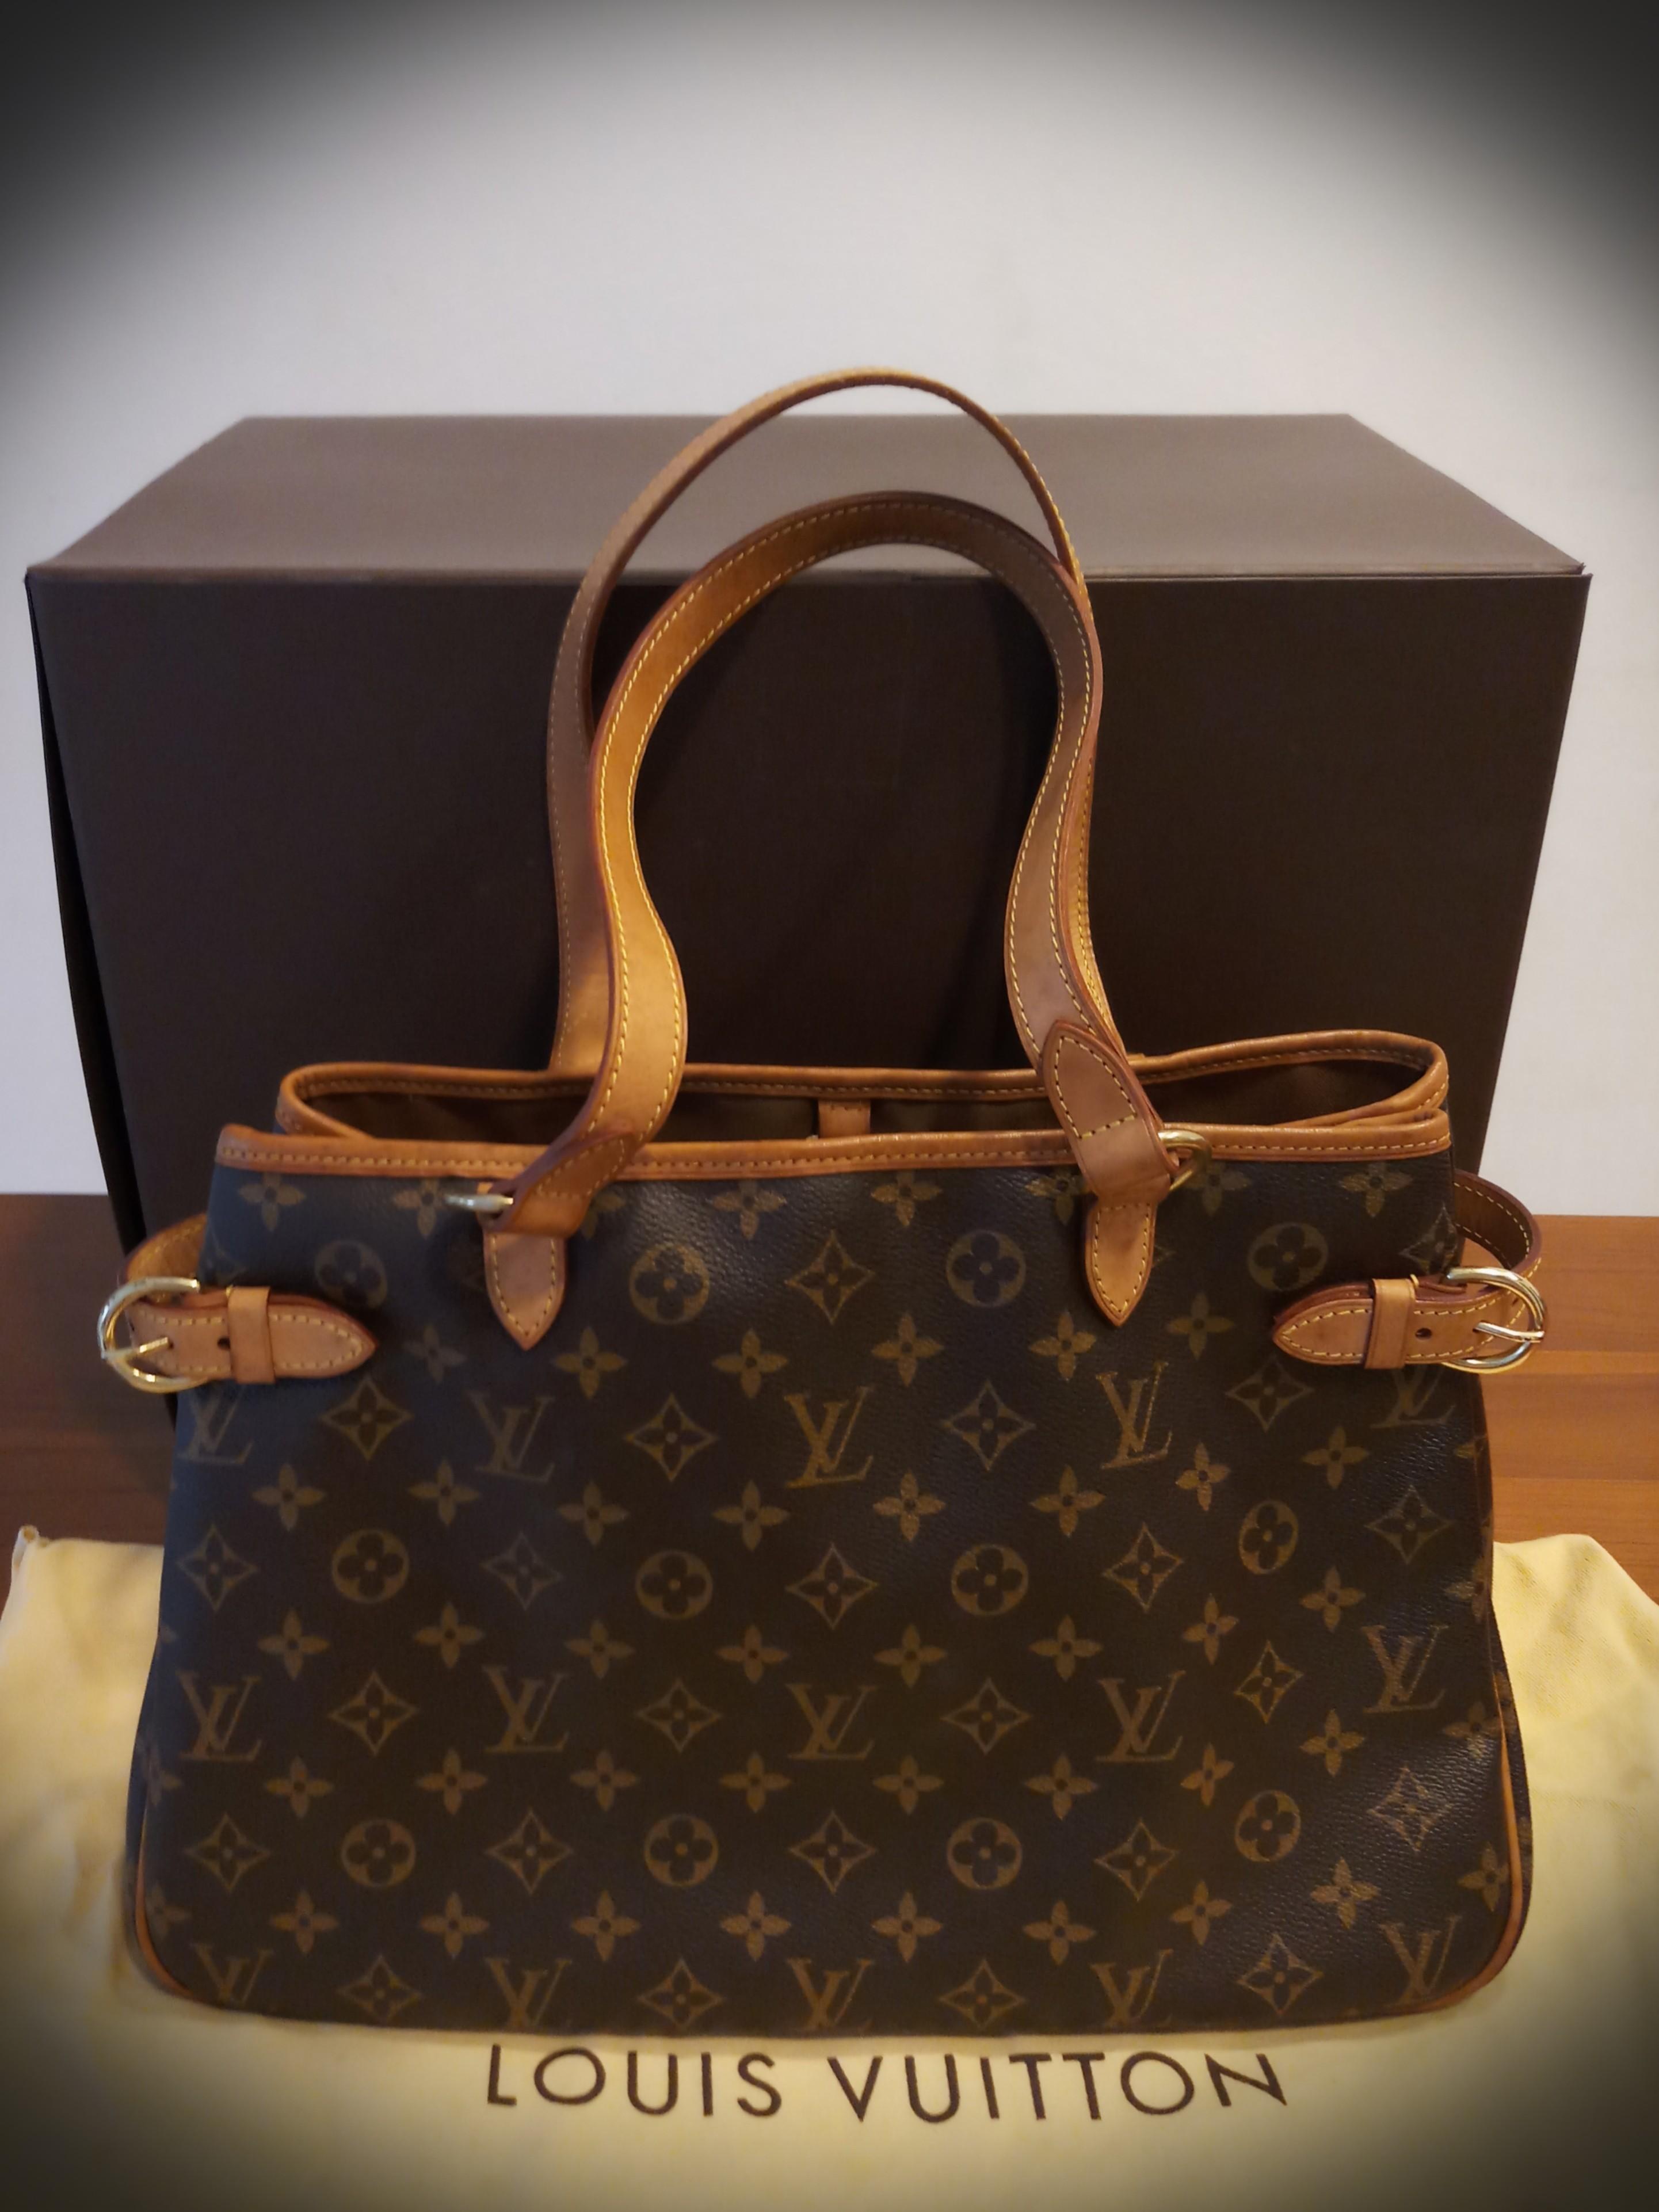 LOUIS VUITTON Batignolles Horizontal Tote Bag Monogram M51154, Luxury, Bags    Wallets, Handbags on Carousell e3071530ed